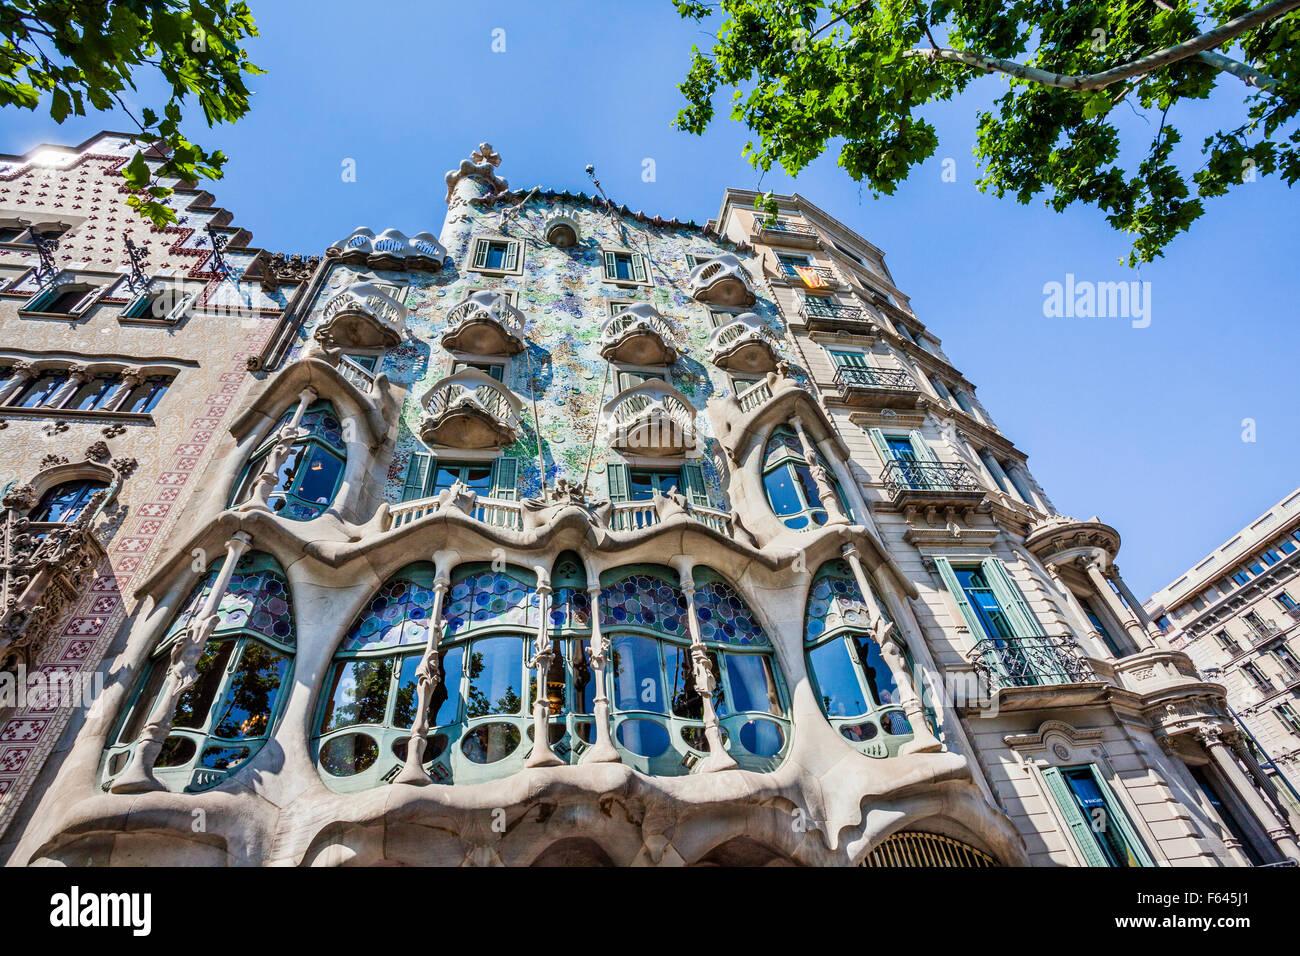 Spanien, Katatonie, Barcelona, Casa Batlló am Passeig de Gràcia, im Jahre 1904 von Antoni Gaudi neu gestaltet Stockbild